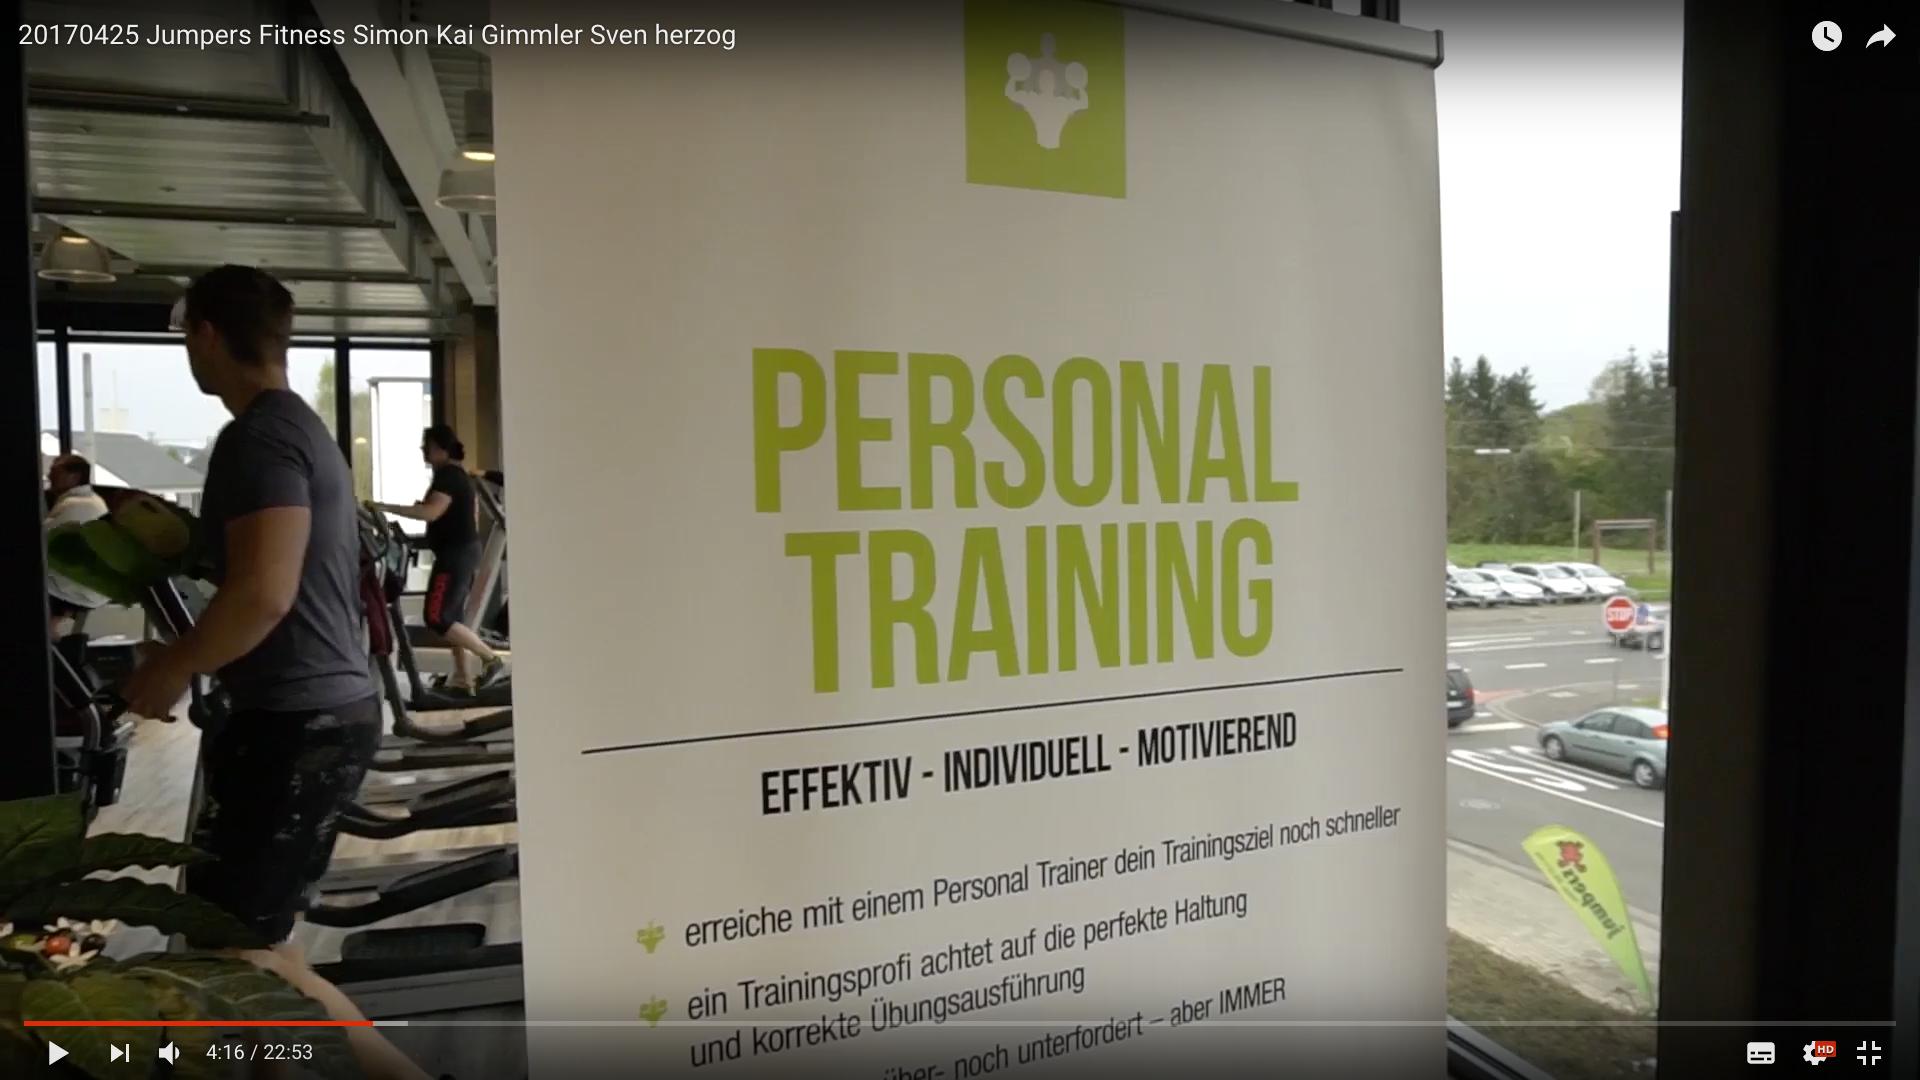 2017 Jumpers Fitness Simon Kai Gimmler Personal Training_MSM_MEDIEN_SAAR_MOSEL_SAARLAND_FERNSEHEN_1_ED_SAAR